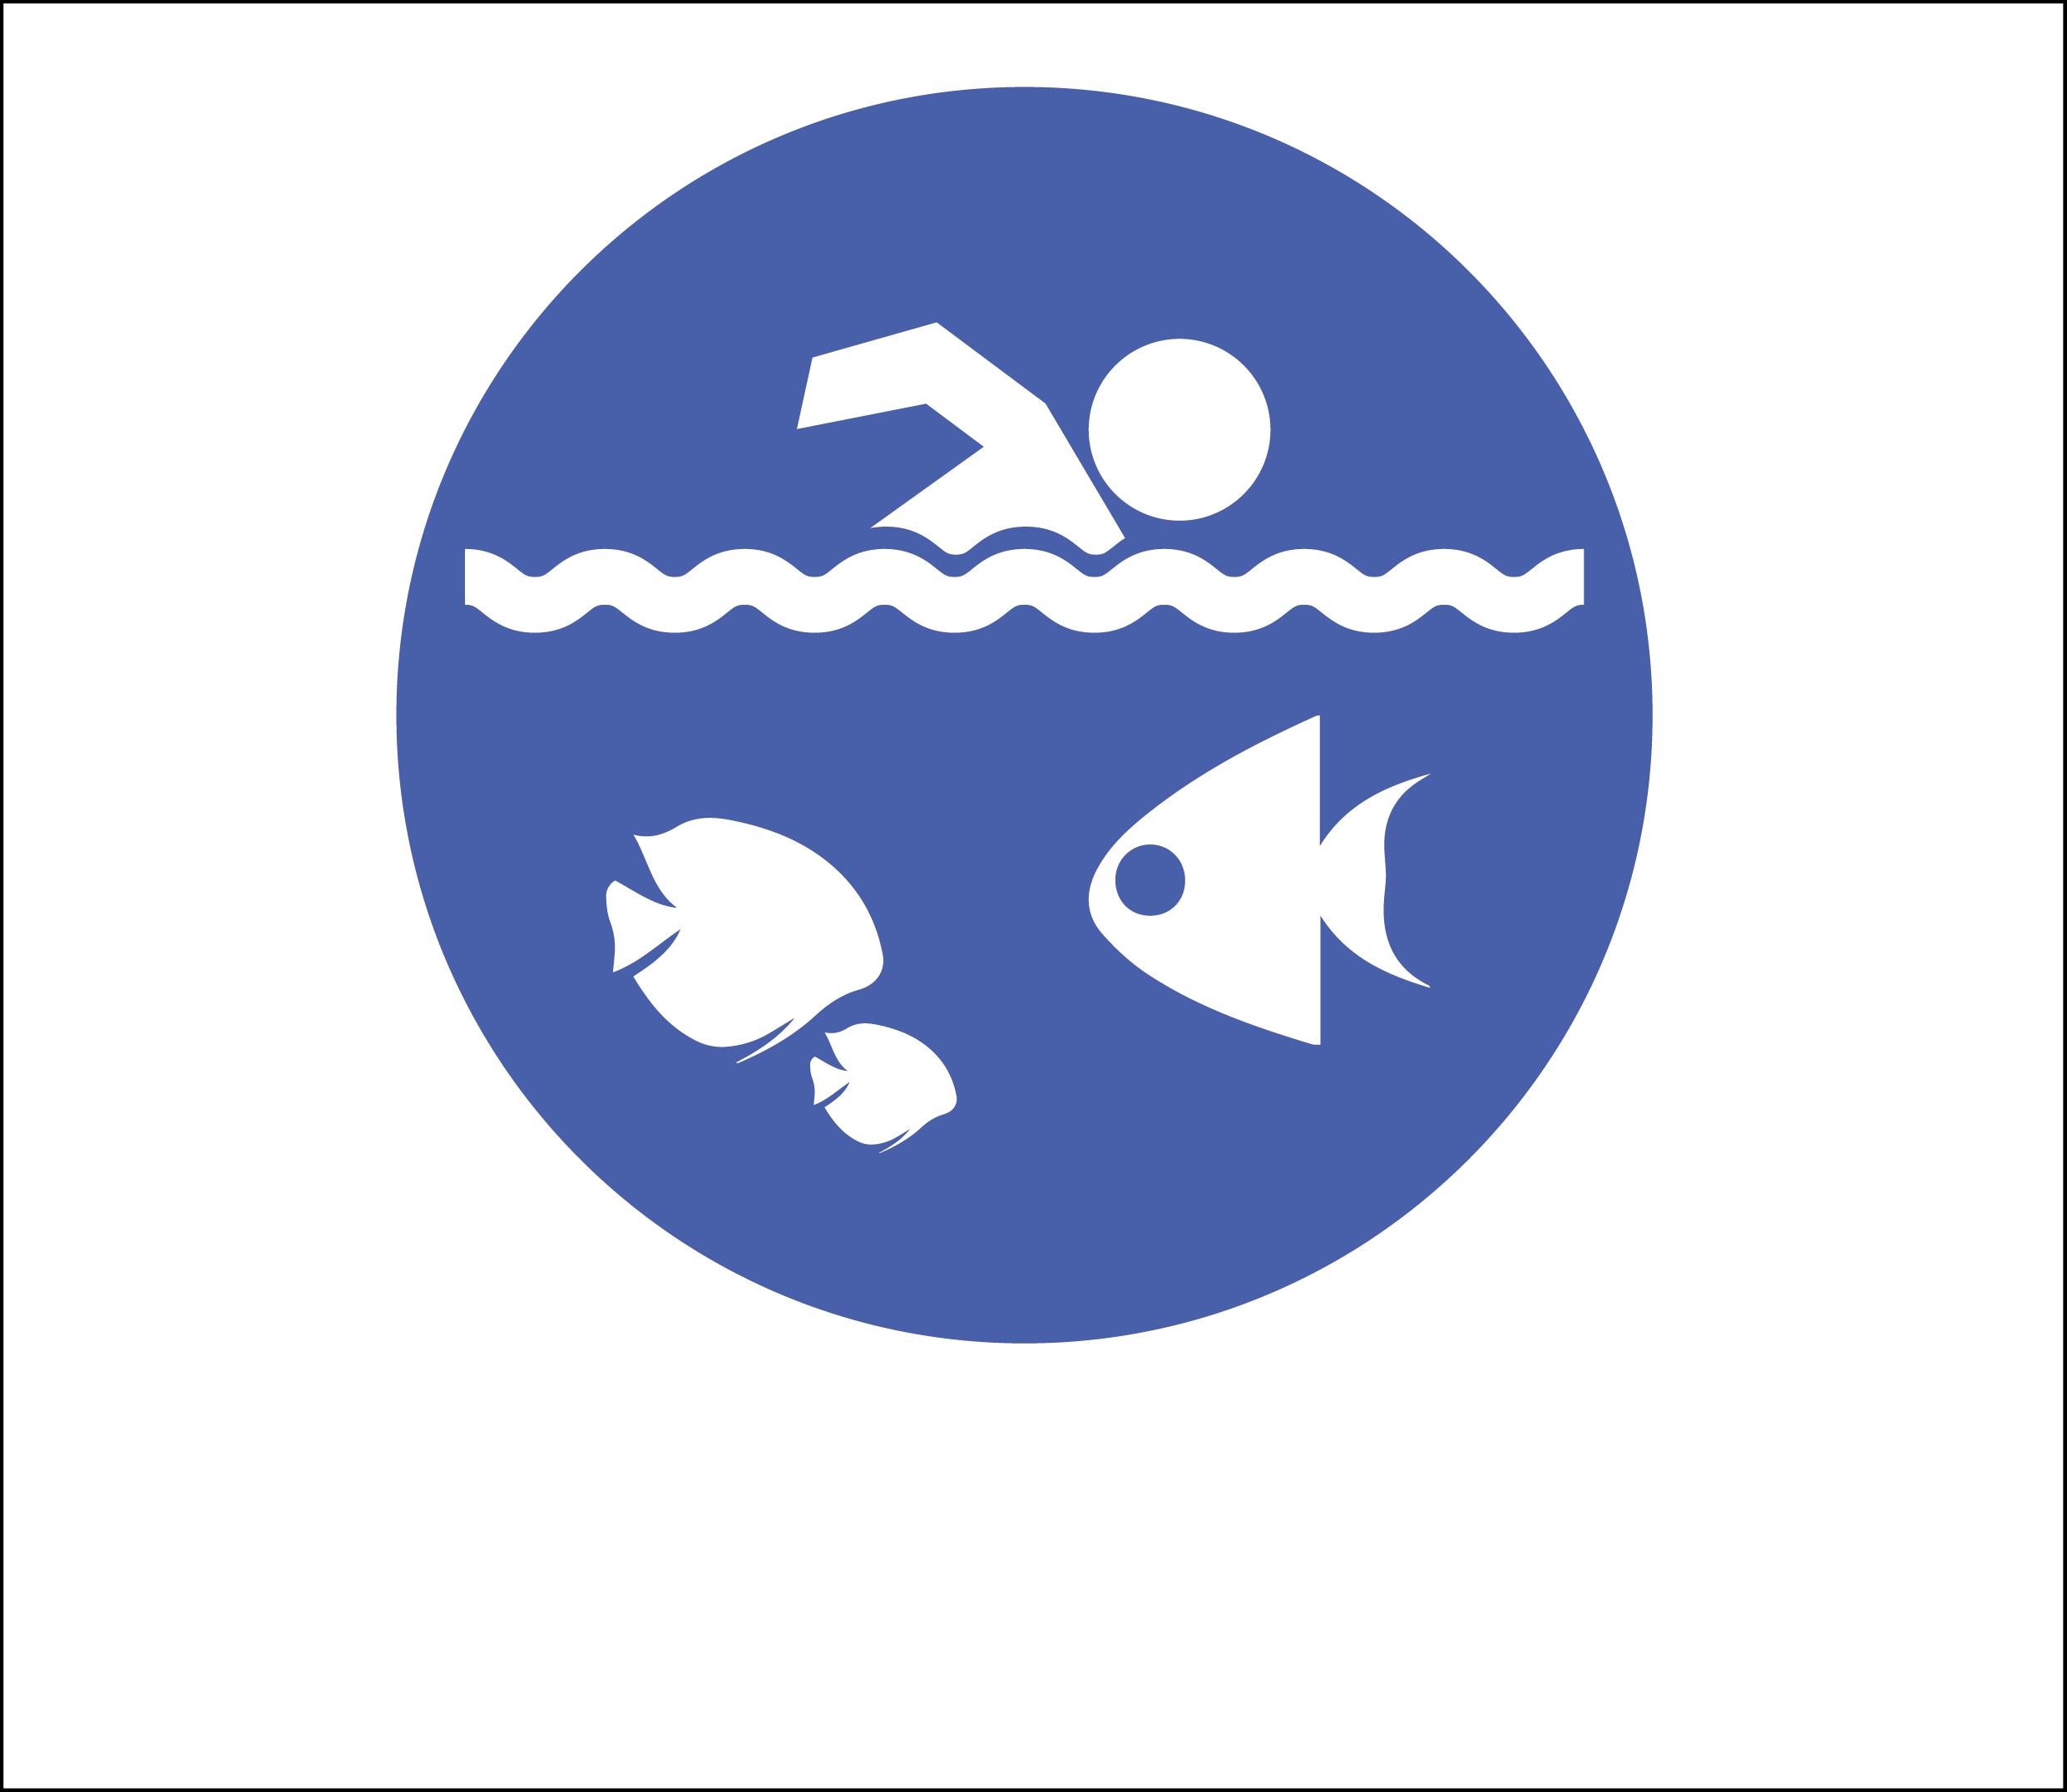 La cenote pool : nager en observant les poissons exotiques